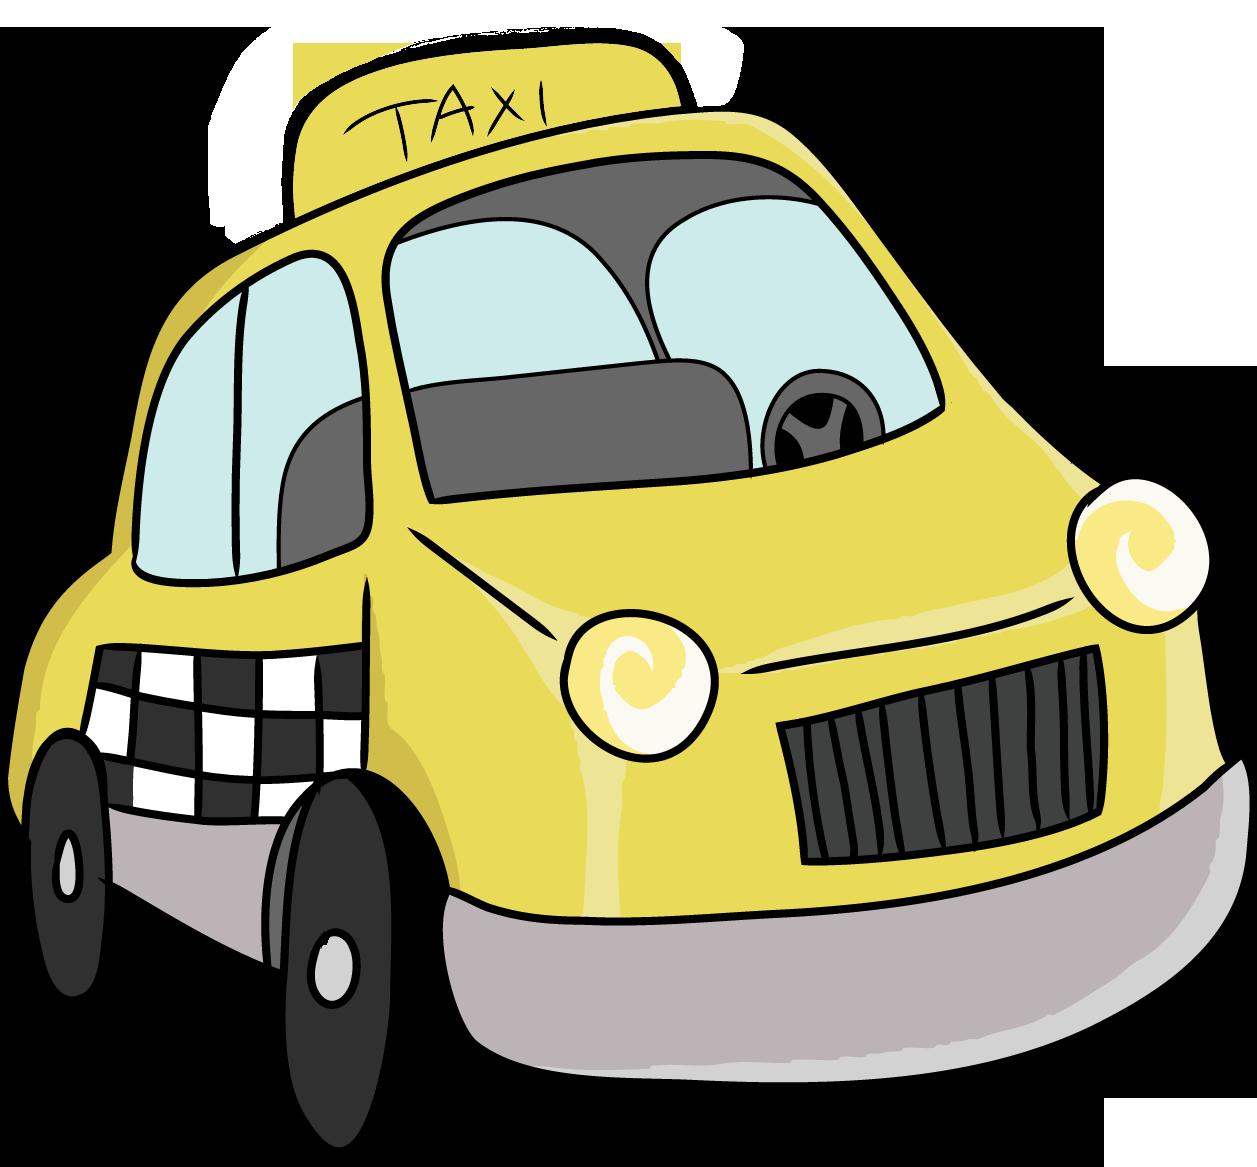 1257x1167 Taxi Car Clipart